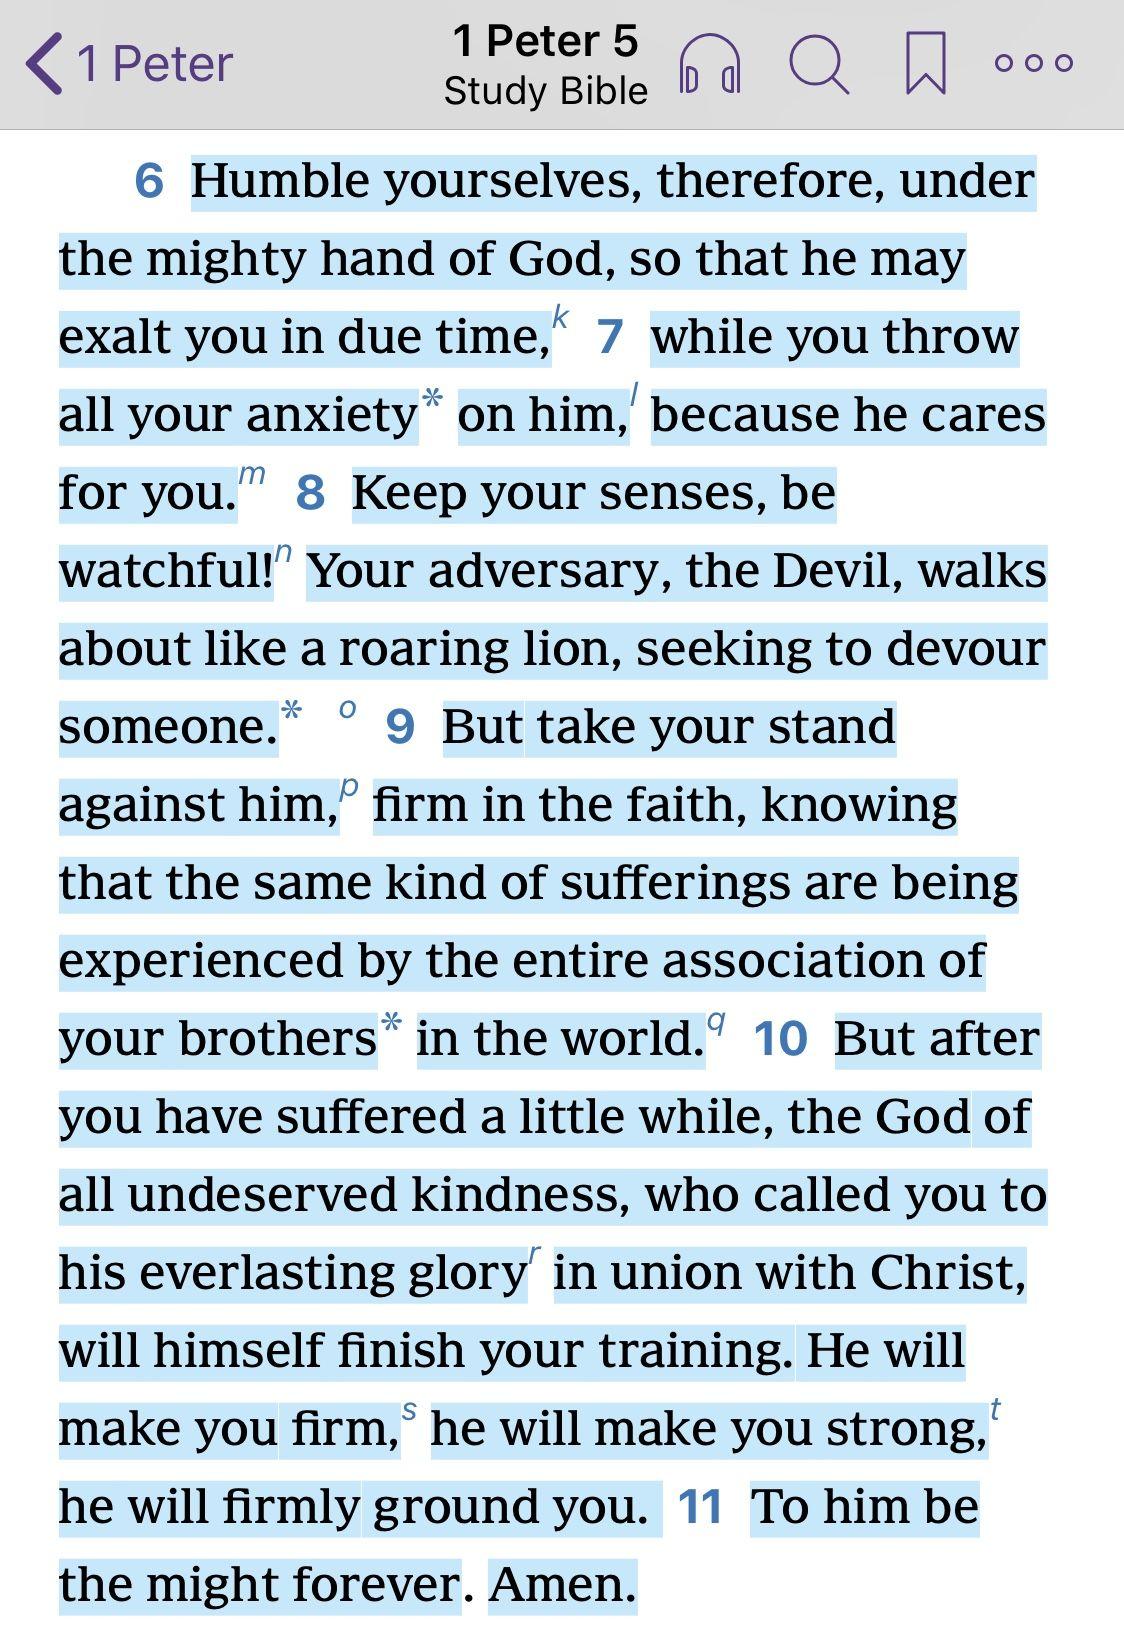 Pin by Kar3n.59 on BibleLearnLoveLive it Bible study